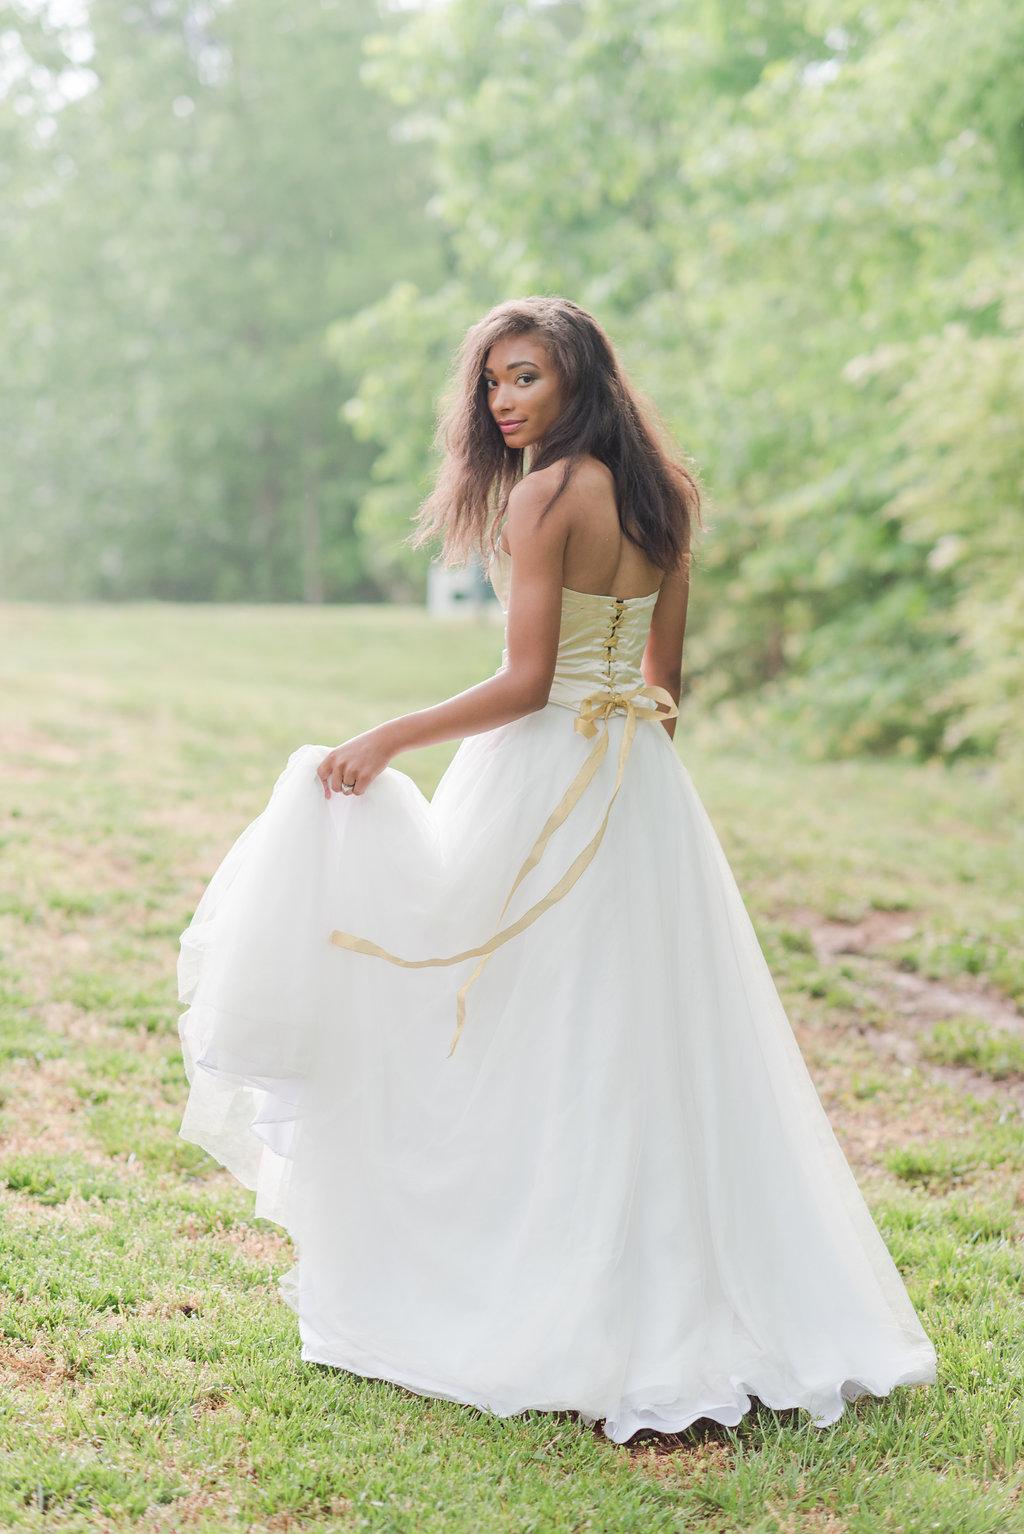 sunshower-photography-adorn-bridal-56.jpg